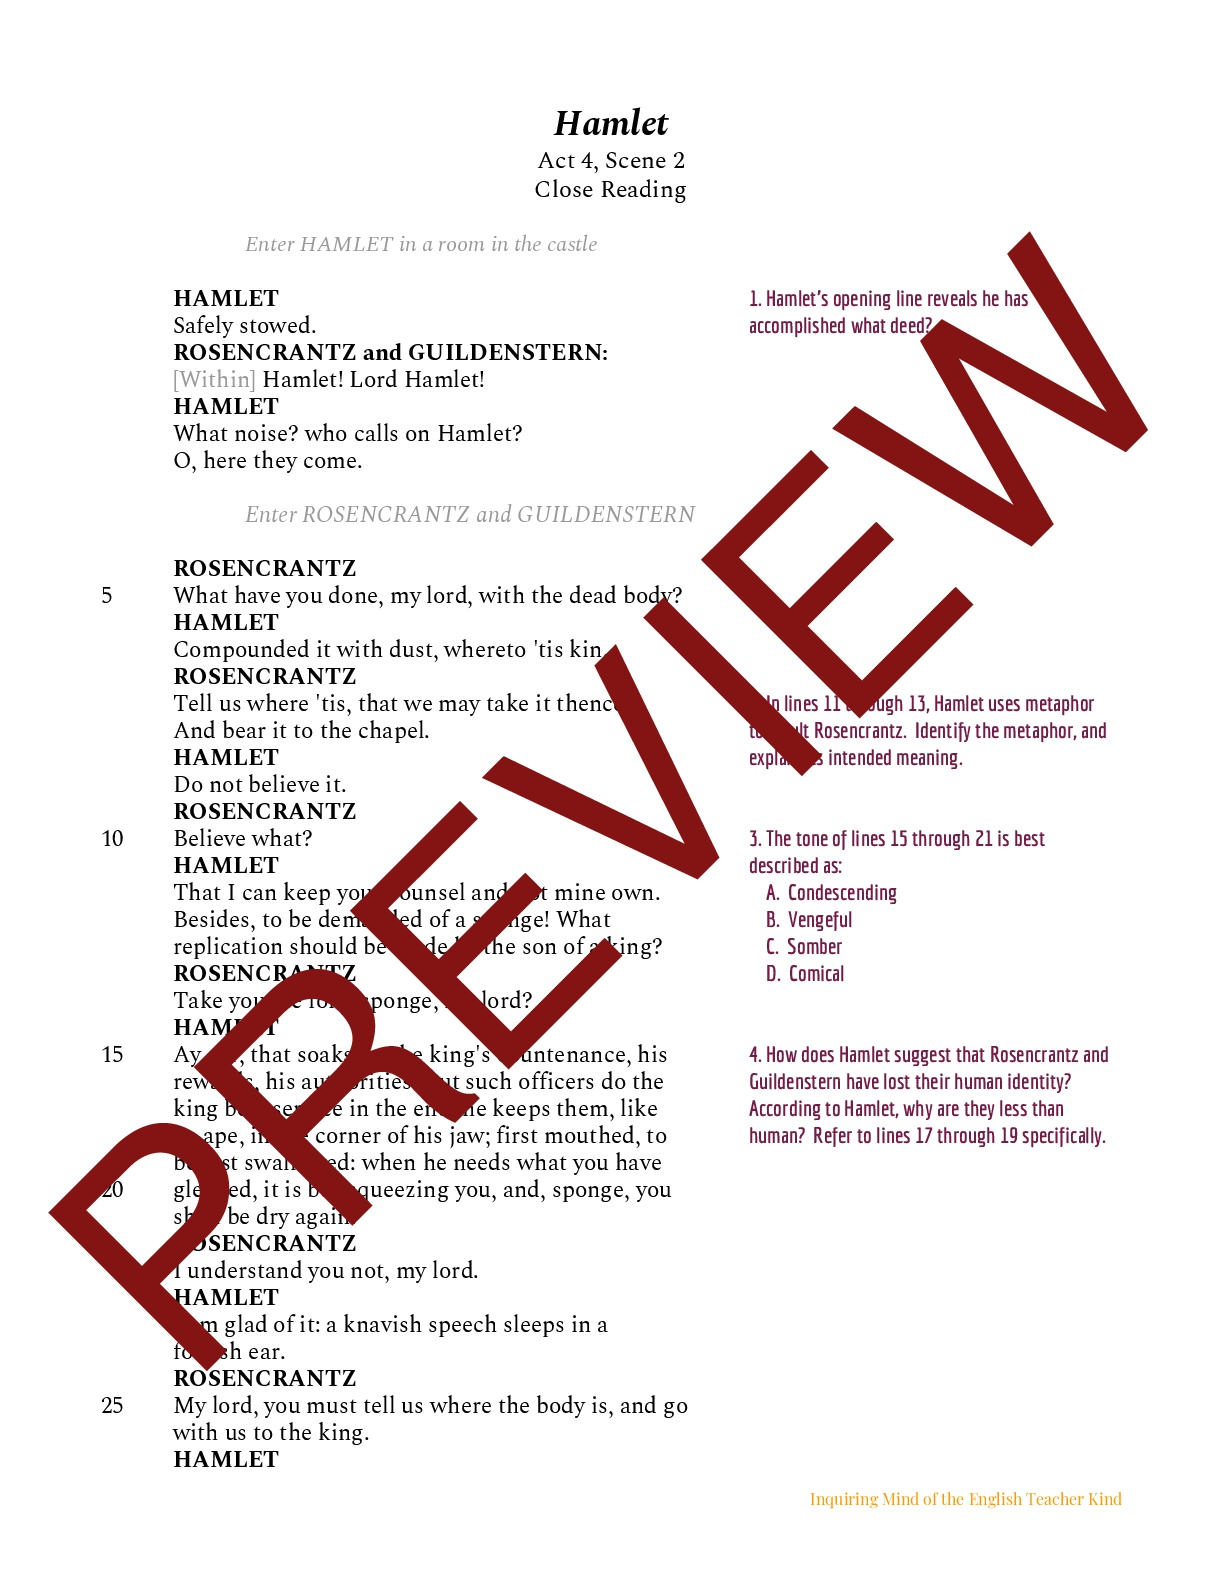 Shakespeare S Hamlet Close Reading Of Act 4 Scene 2 Teaching Resources [ 1584 x 1224 Pixel ]